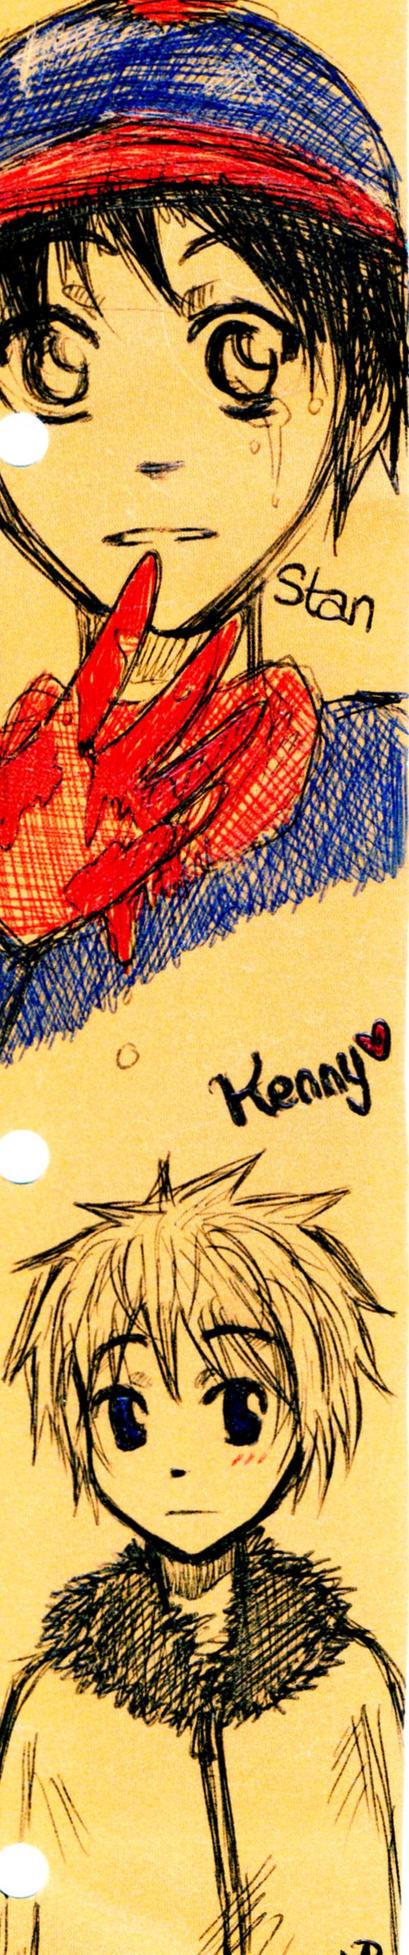 SP : Kenny and Stan by liar-must-die